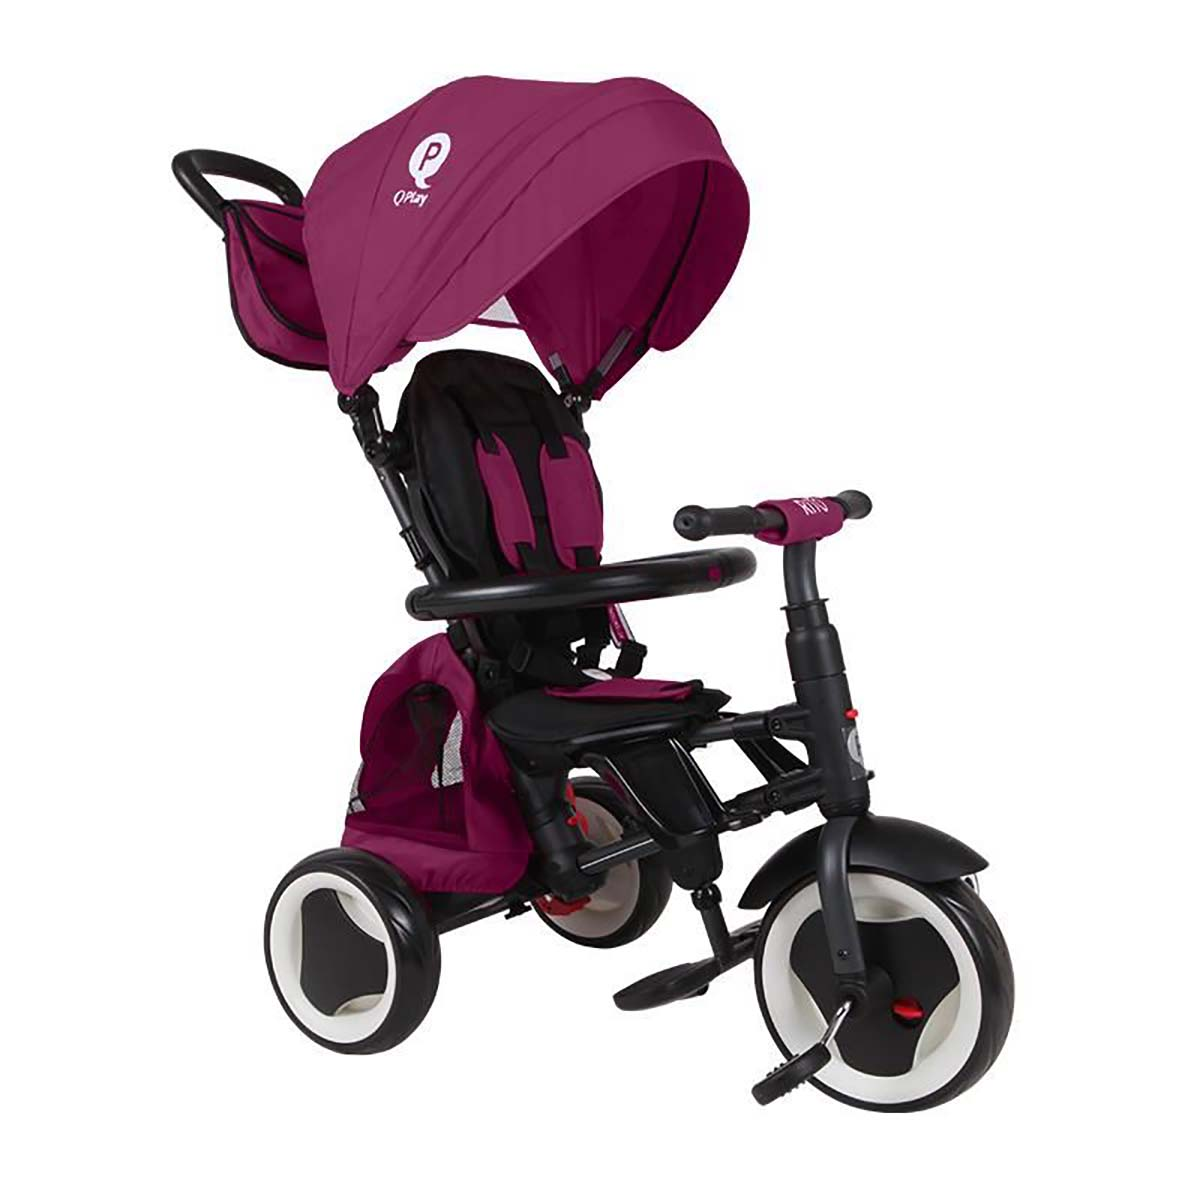 Tricicleta pliabila Qplay Rito Plus, Violet imagine